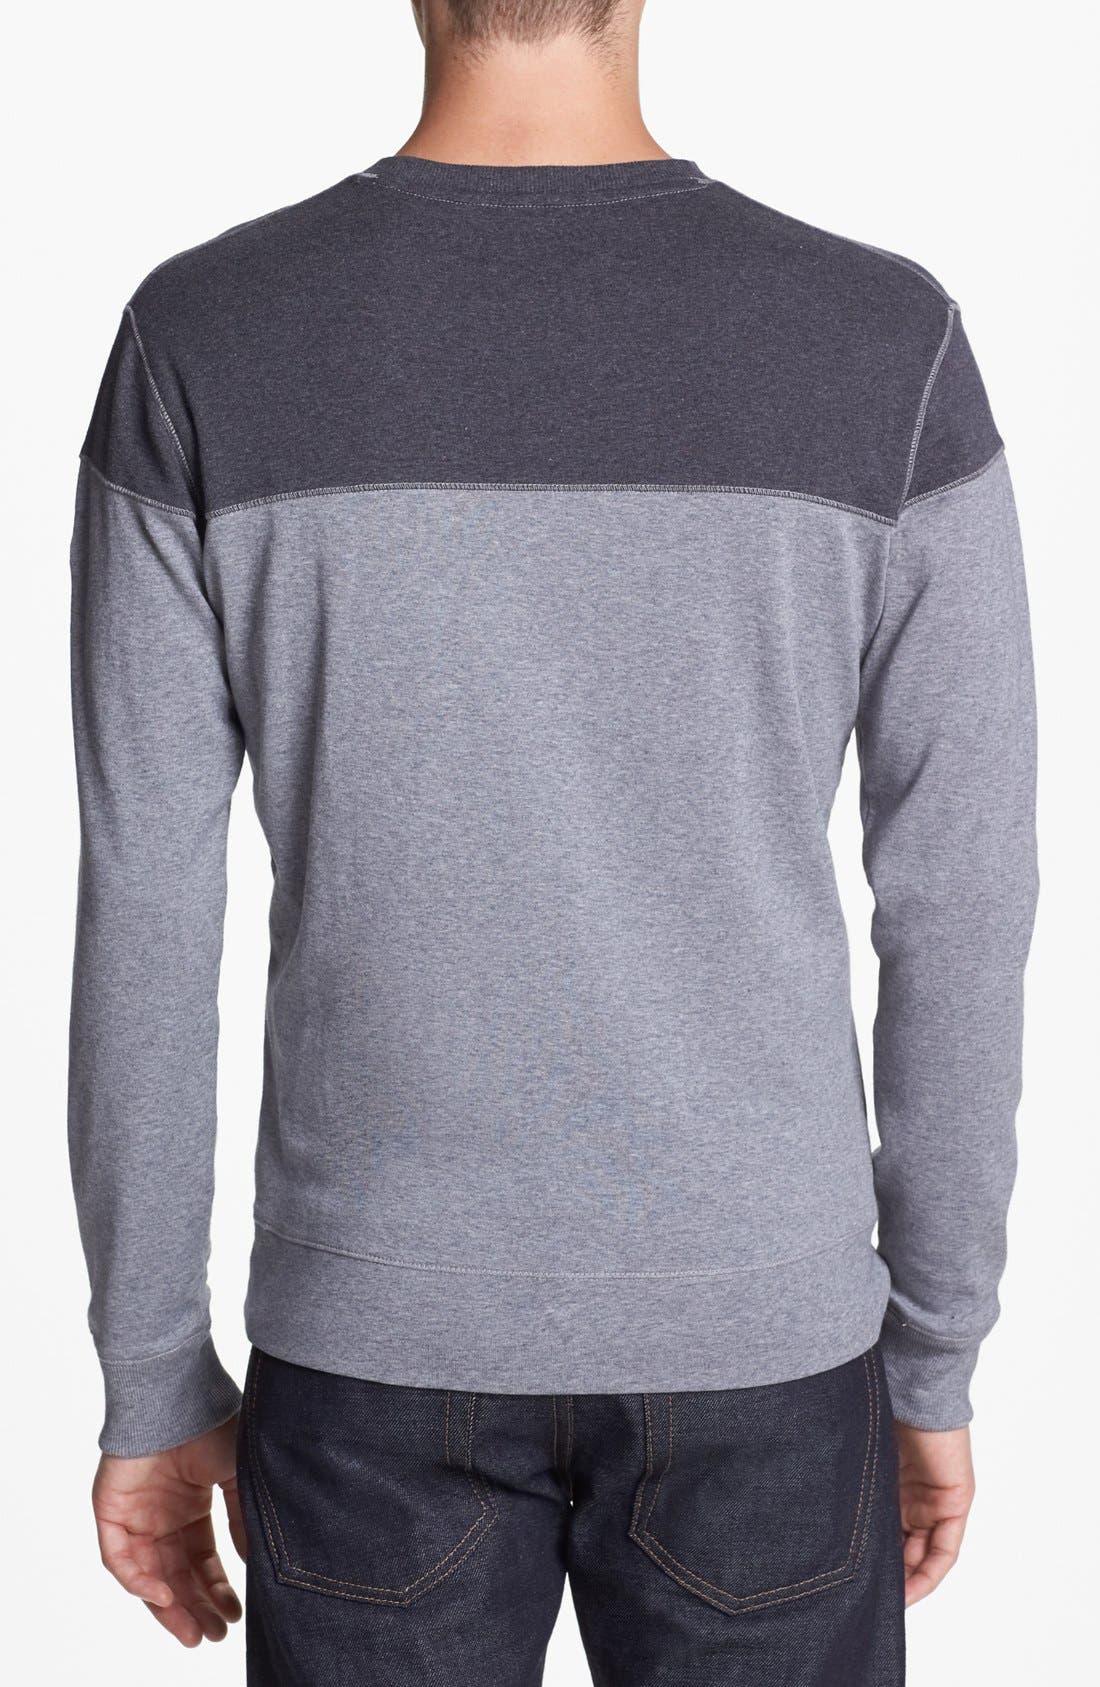 VICTORINOX SWISS ARMY<SUP>®</SUP>,                             Long Sleeve T-Shirt,                             Alternate thumbnail 2, color,                             065